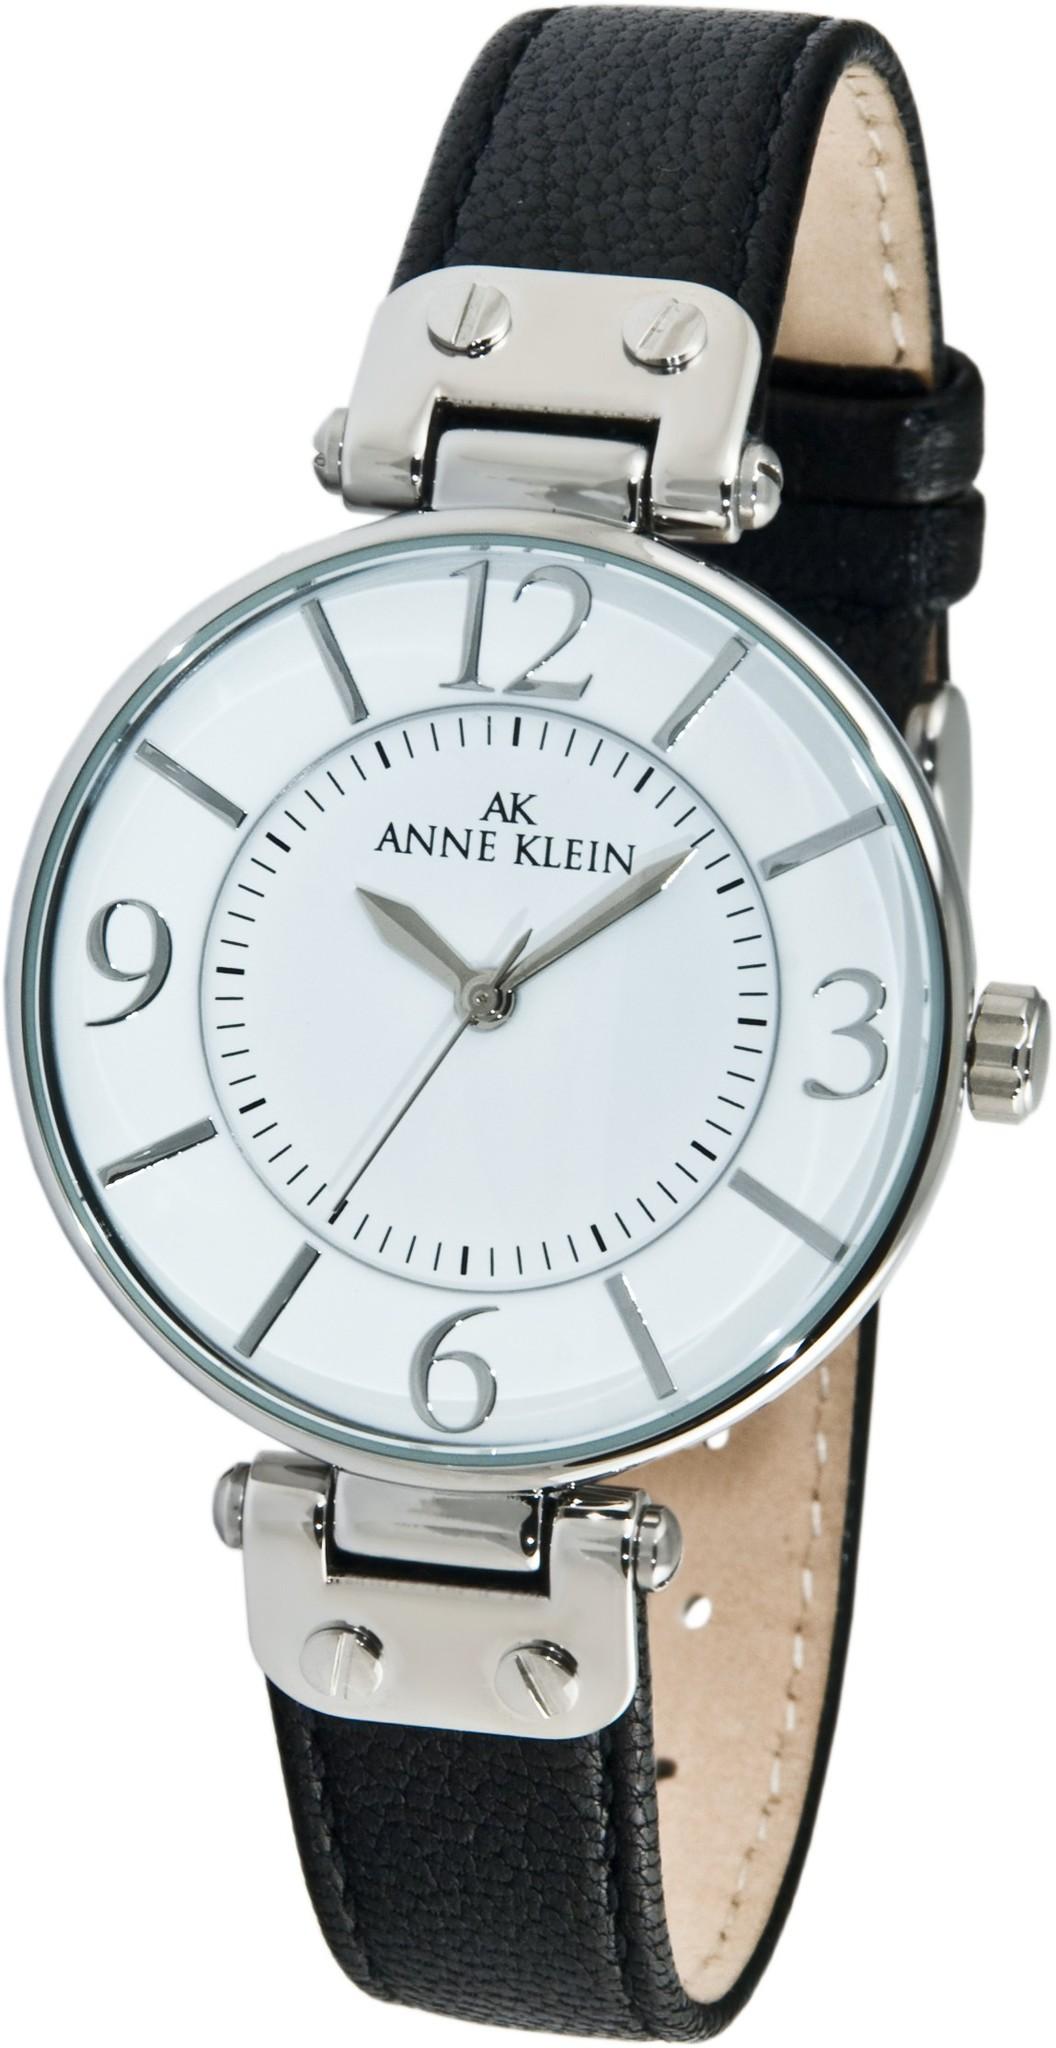 Anne Klein 9169WTBK - женские наручные часы из коллекции RingAnne Klein<br><br><br>Бренд: Anne Klein<br>Модель: Anne Klein 9169 WTBK<br>Артикул: 9169WTBK<br>Вариант артикула: None<br>Коллекция: Ring<br>Подколлекция: None<br>Страна: США<br>Пол: женские<br>Тип механизма: кварцевые<br>Механизм: None<br>Количество камней: None<br>Автоподзавод: None<br>Источник энергии: от батарейки<br>Срок службы элемента питания: None<br>Дисплей: стрелки<br>Цифры: арабские<br>Водозащита: WR 20<br>Противоударные: None<br>Материал корпуса: нерж. сталь<br>Материал браслета: кожа<br>Материал безеля: None<br>Стекло: минеральное<br>Антибликовое покрытие: None<br>Цвет корпуса: None<br>Цвет браслета: None<br>Цвет циферблата: None<br>Цвет безеля: None<br>Размеры: None<br>Диаметр: None<br>Диаметр корпуса: None<br>Толщина: None<br>Ширина ремешка: None<br>Вес: None<br>Спорт-функции: None<br>Подсветка: None<br>Вставка: None<br>Отображение даты: None<br>Хронограф: None<br>Таймер: None<br>Термометр: None<br>Хронометр: None<br>GPS: None<br>Радиосинхронизация: None<br>Барометр: None<br>Скелетон: None<br>Дополнительная информация: None<br>Дополнительные функции: None